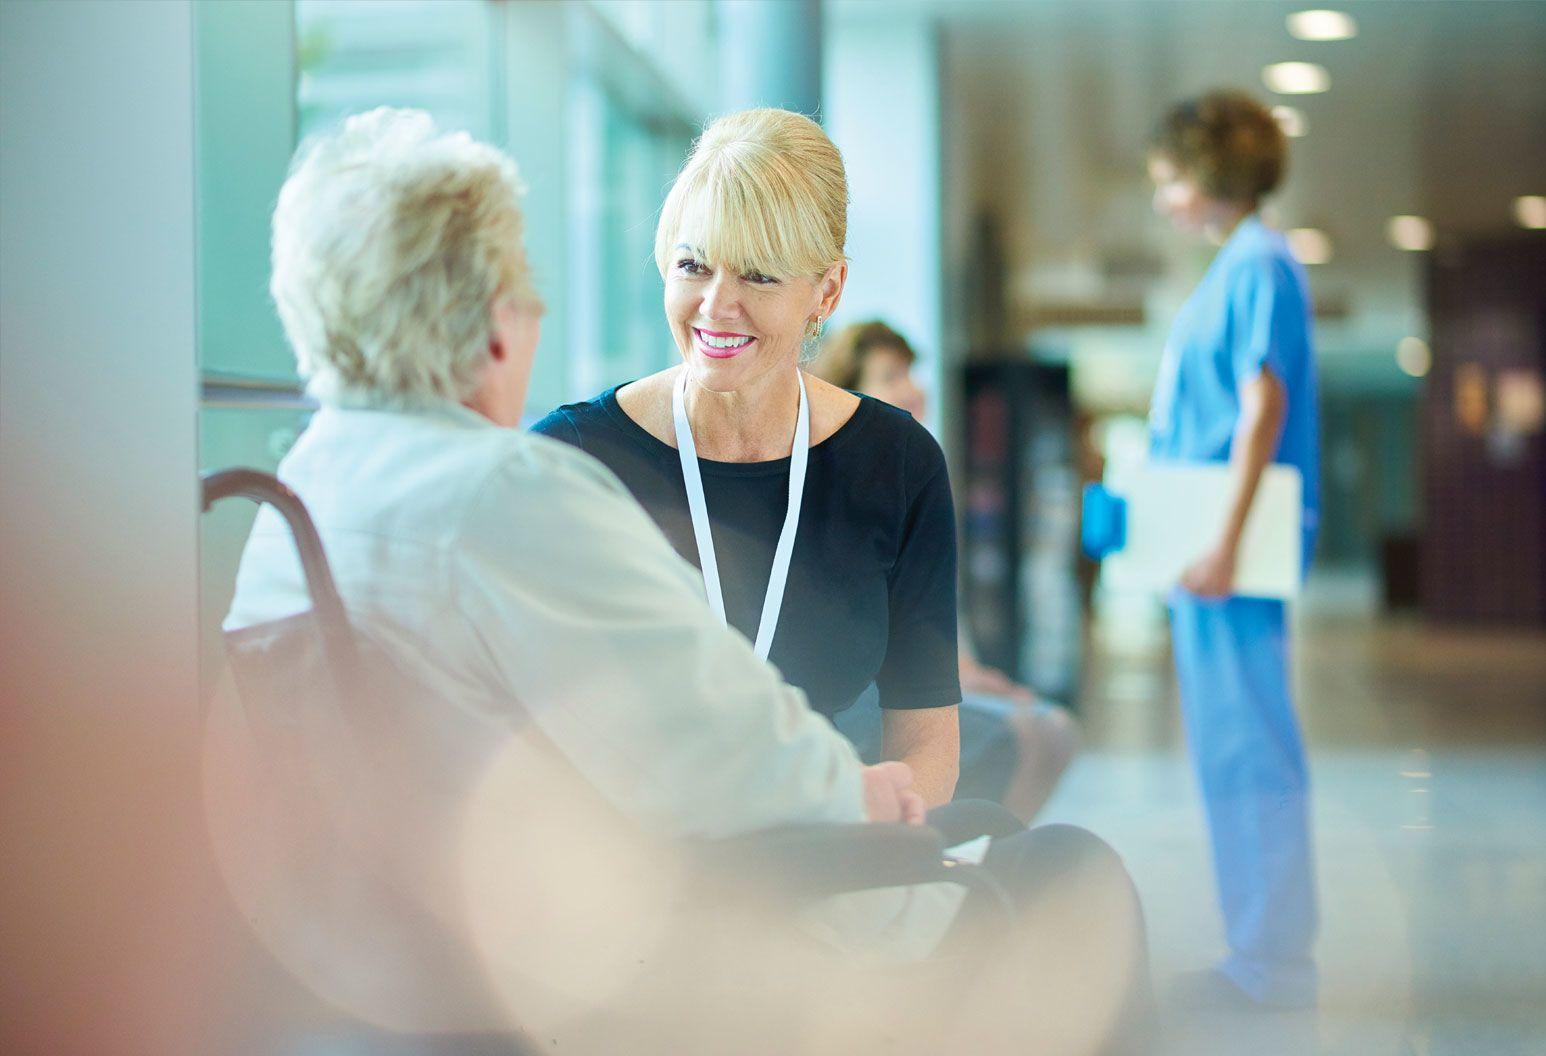 Programs & services - Manhattan Eye, Ear & Throat Hospital